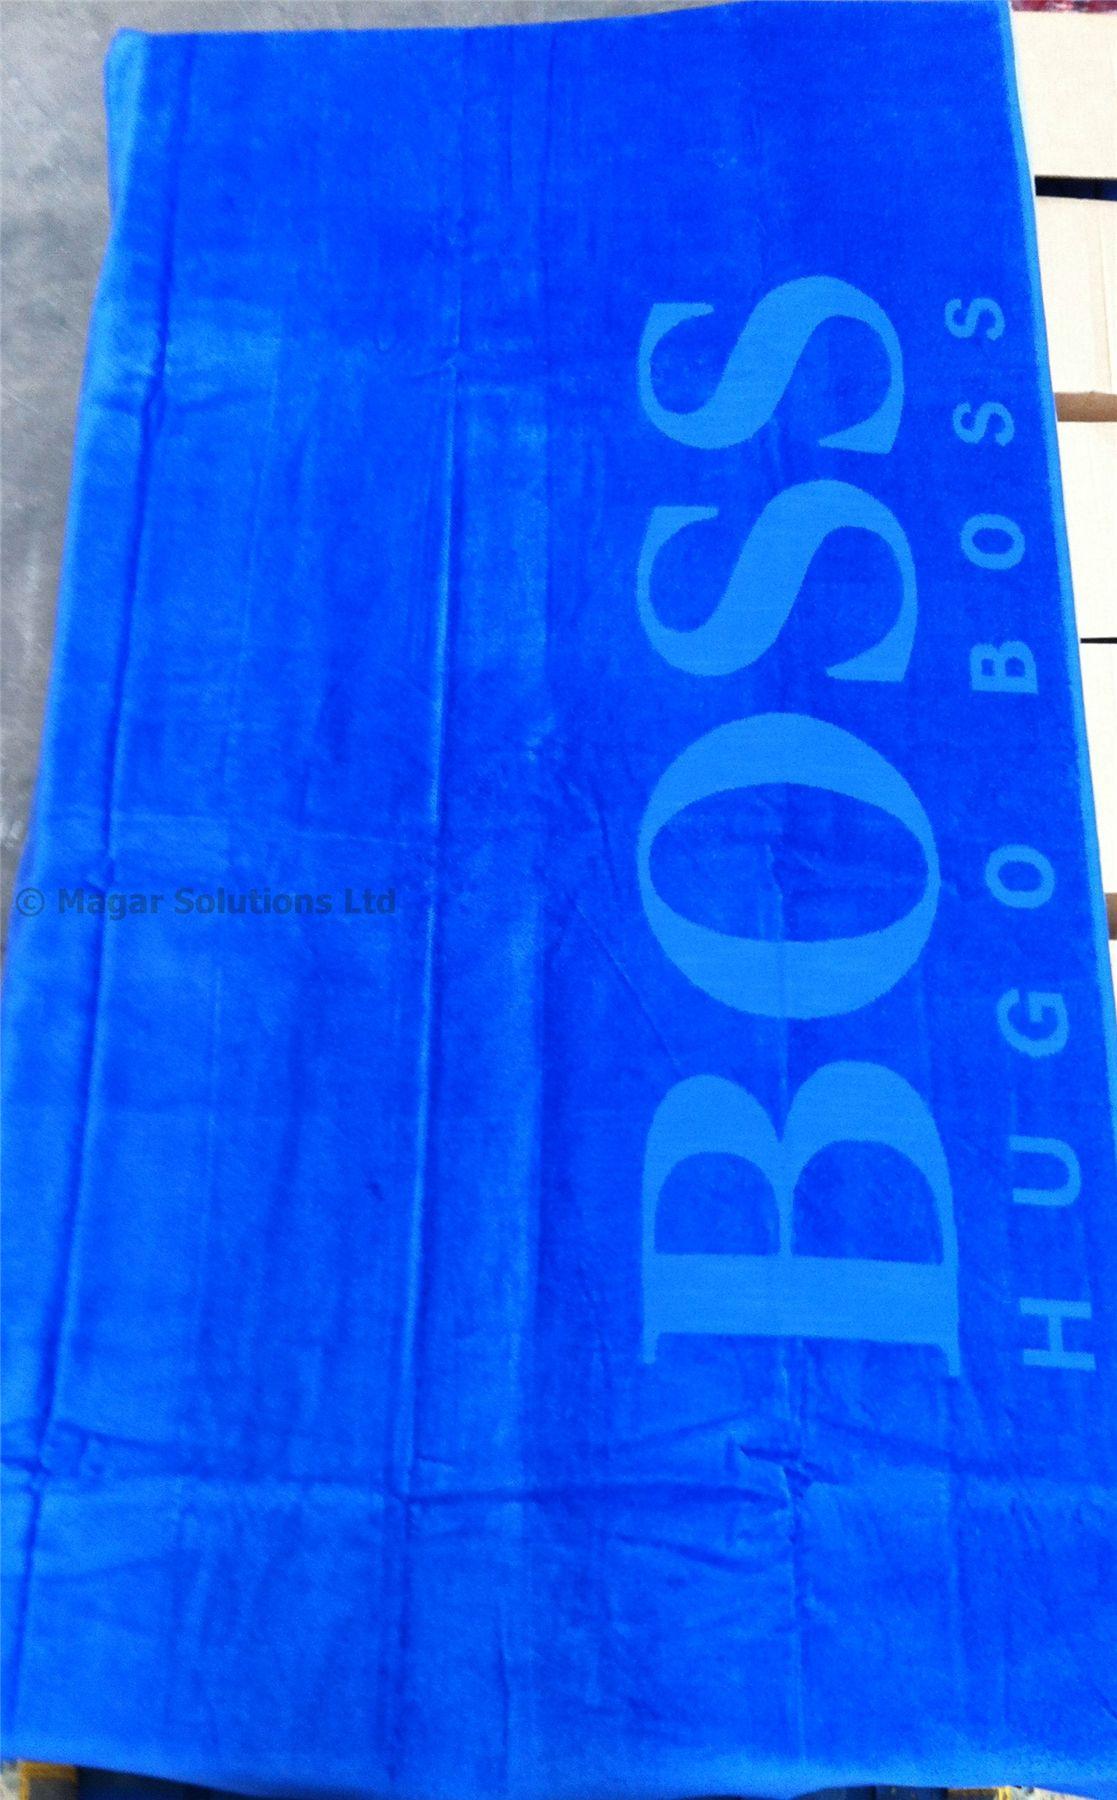 designer beach towels monogram louis vuitton hugo boss beach towel towels towels mince his words